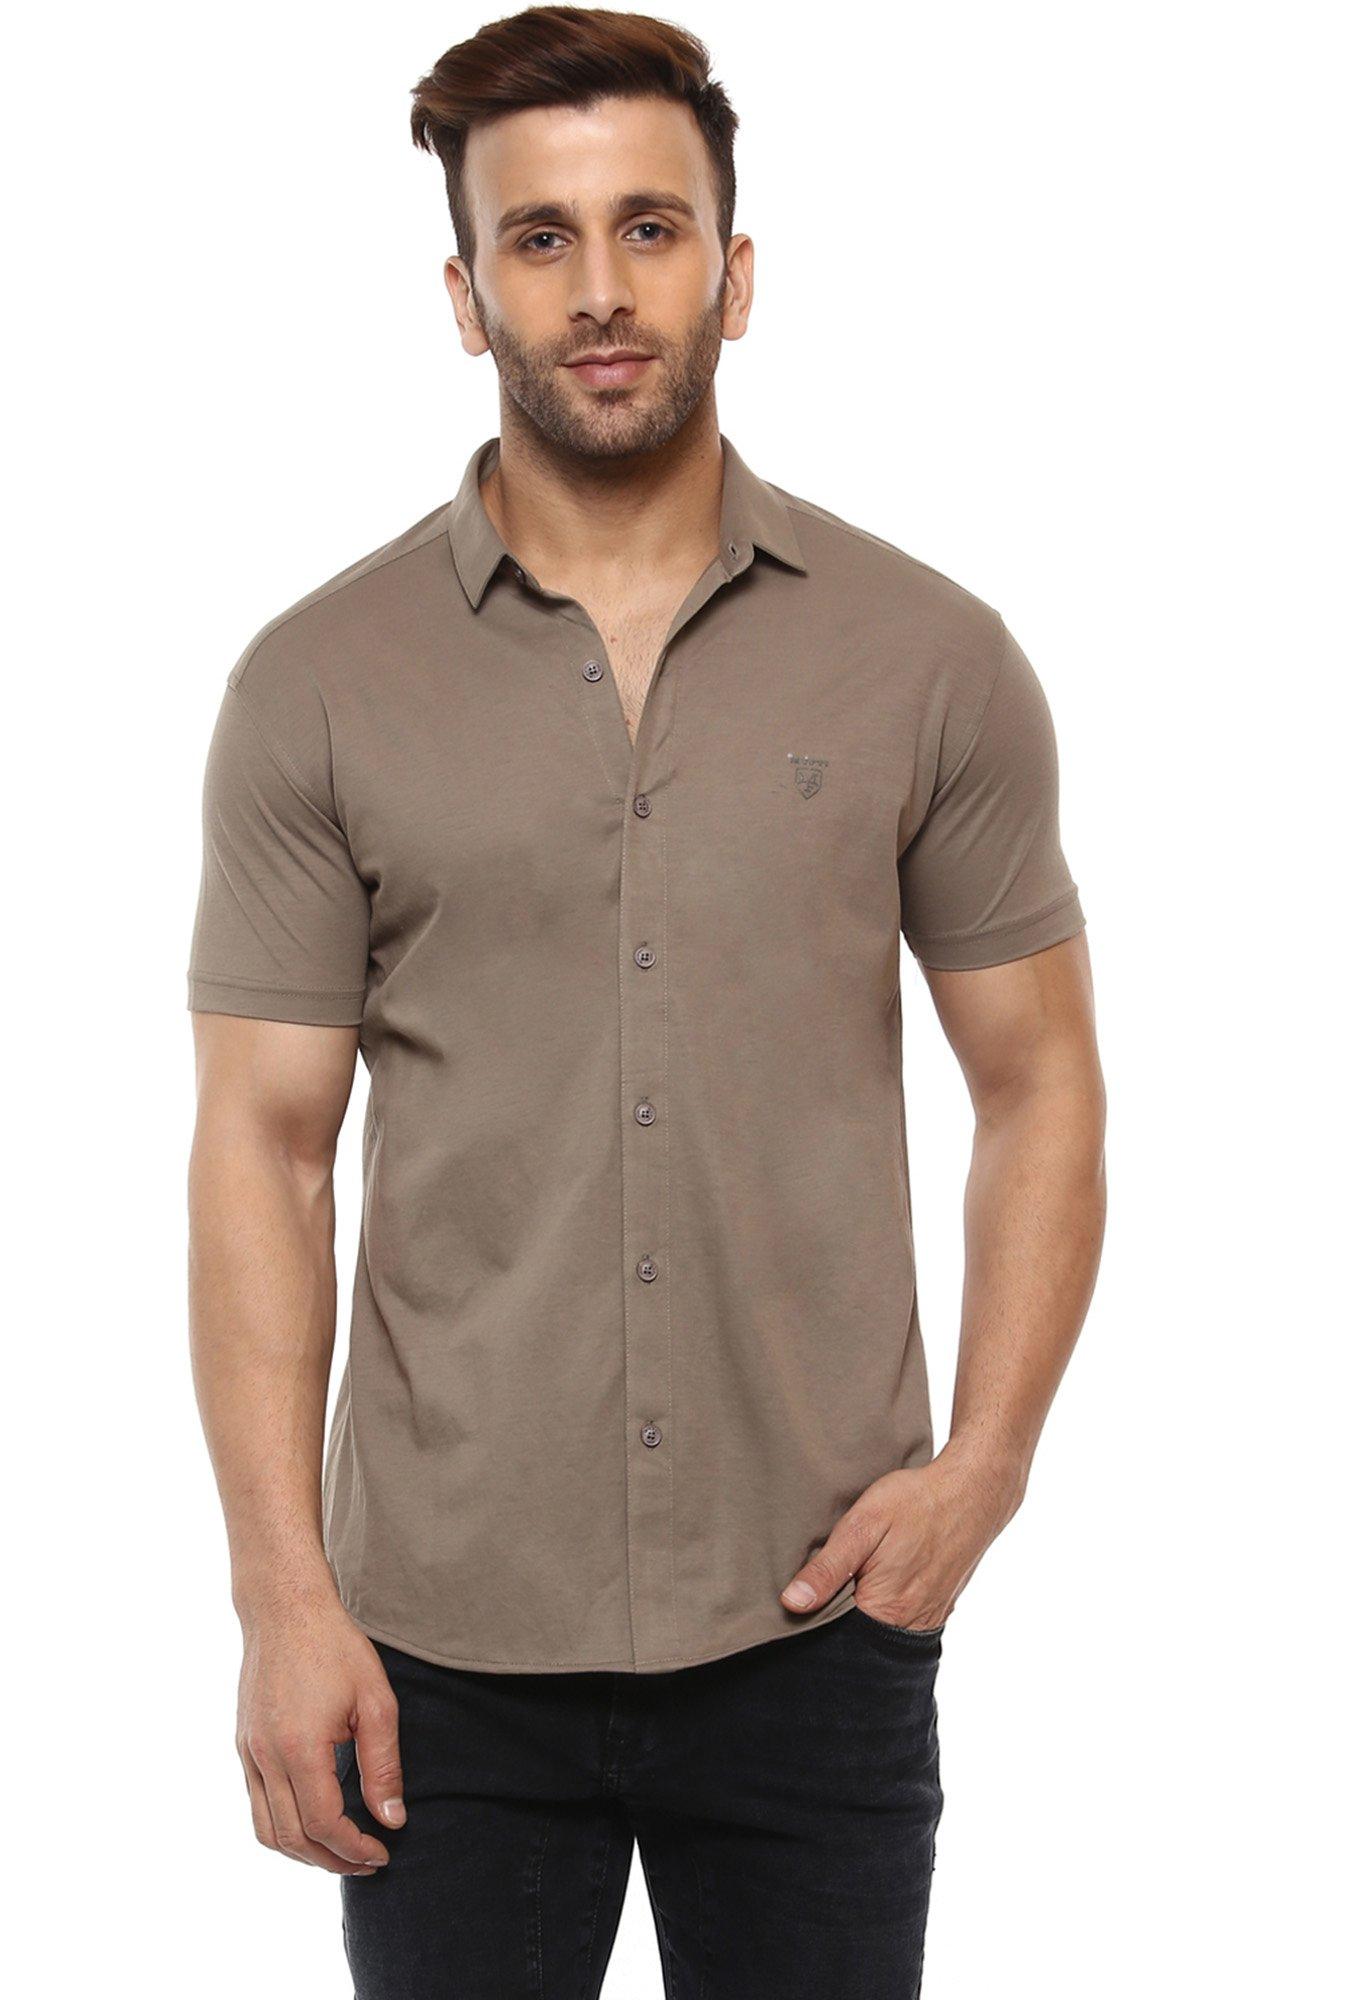 40ab4183 Buy Mufti Brown Half Sleeves Slim Fit Shirt for Men Online @ Tata CLiQ